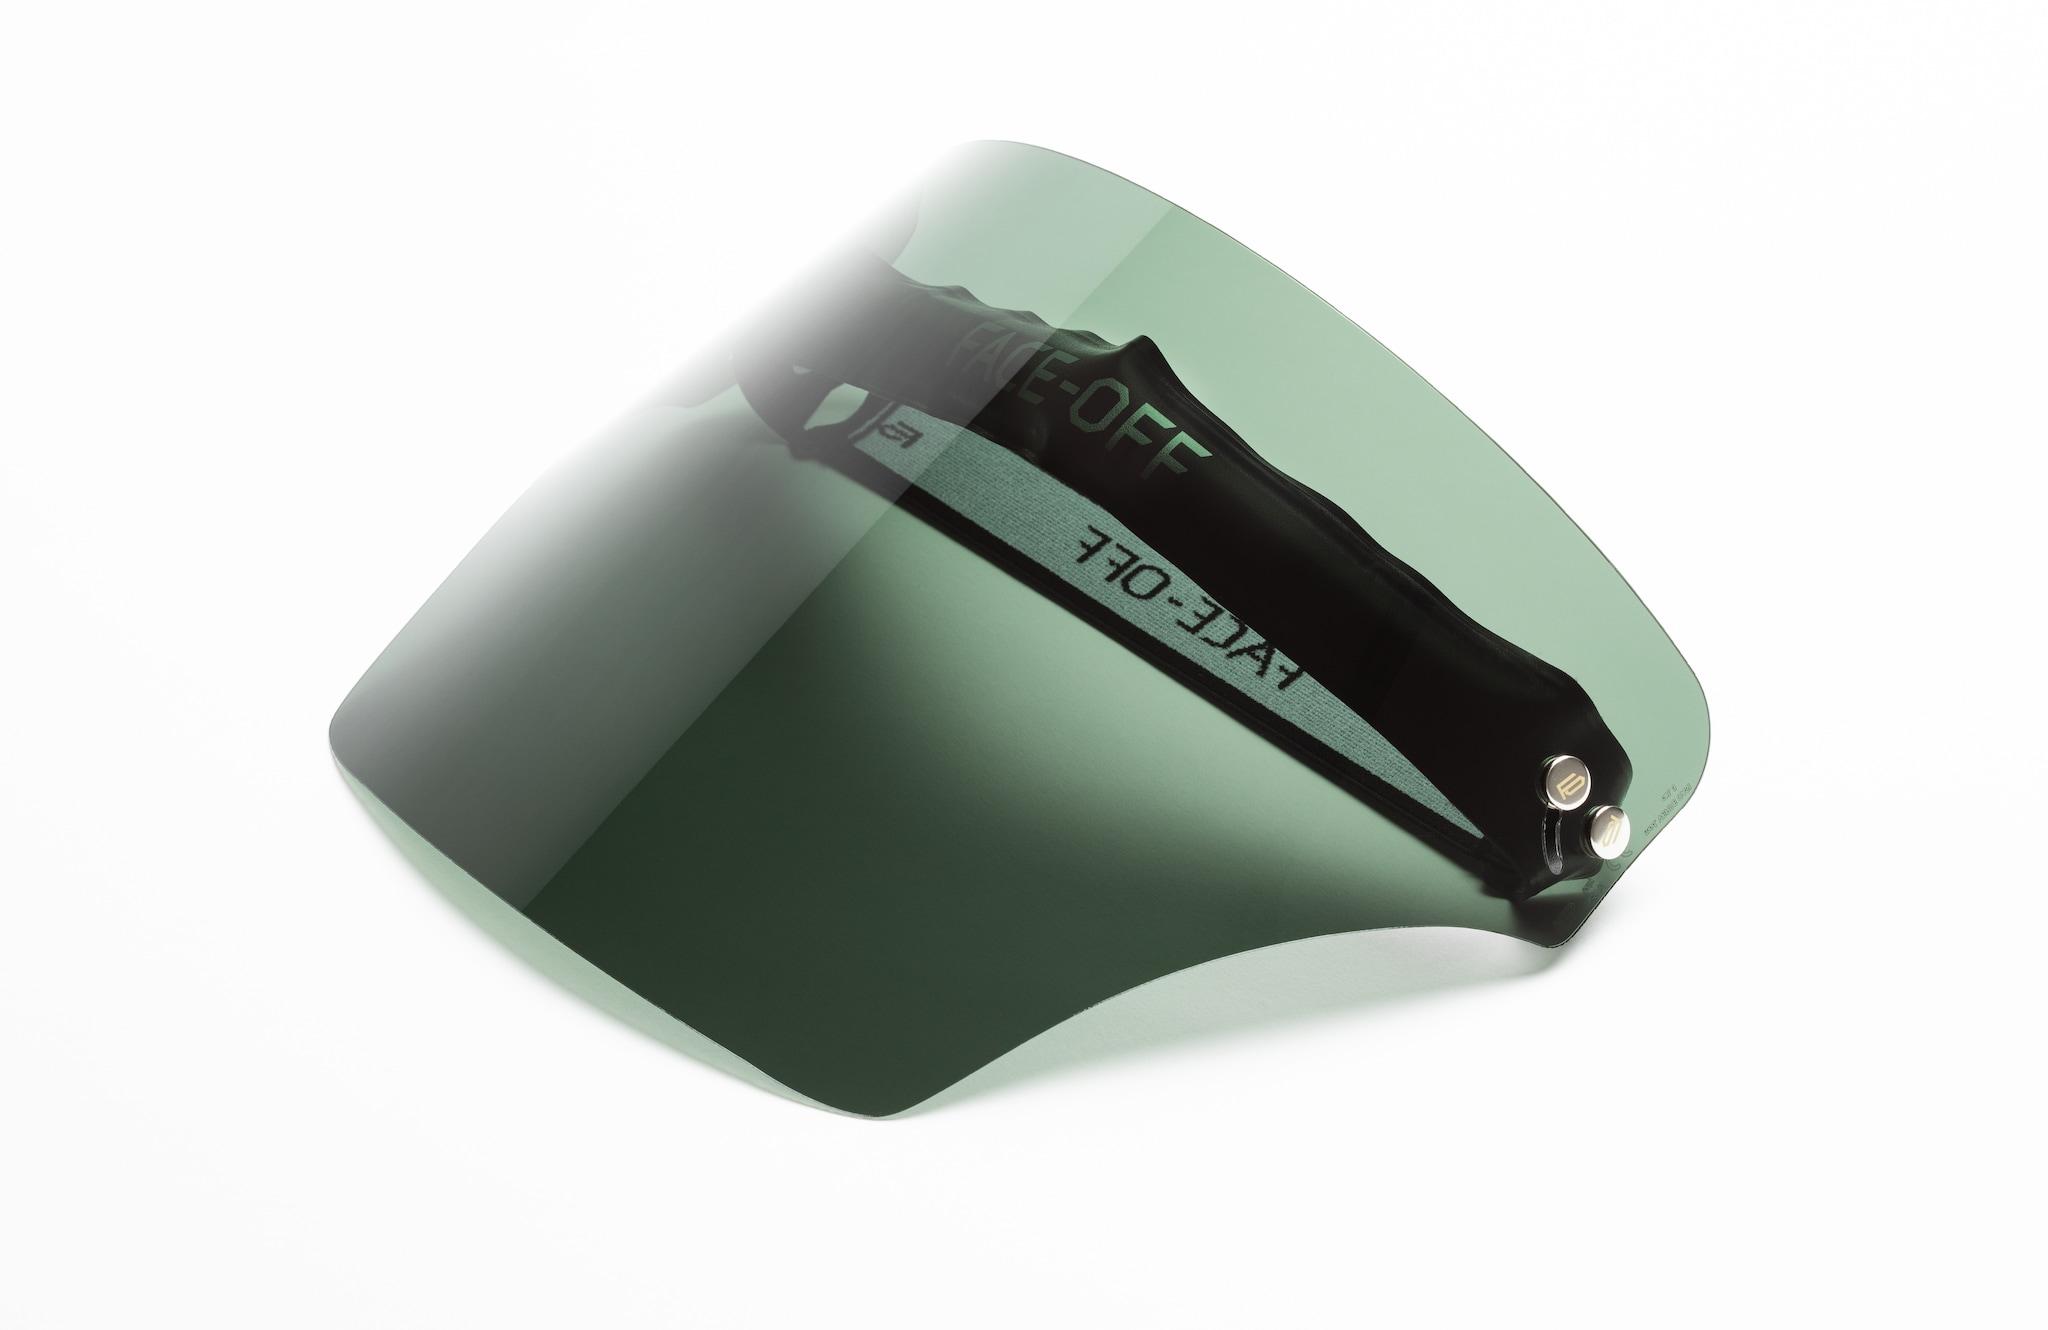 FACE OFF Visiera mobile con fascia in ecopelle e lente a tre tecnologie: fotocromatica, rinforzante e anti appannamento, Green Oasis (199 €).